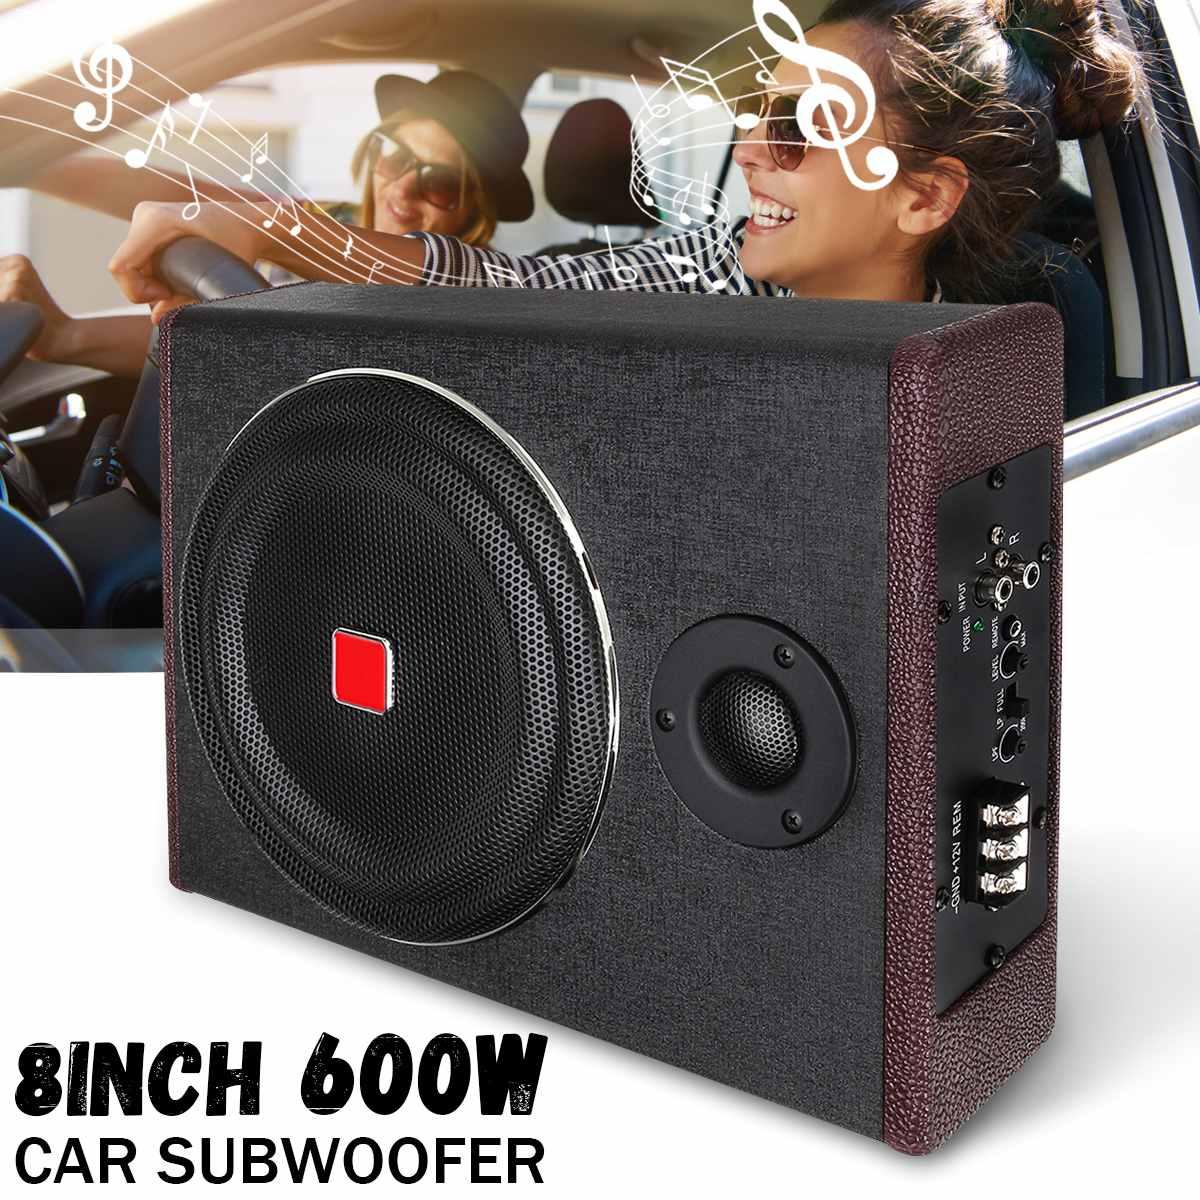 Car-Amplifier Sub Subwoofers Car Speaker Car-Under-Seat Super-Bass Slim 600W 8inch